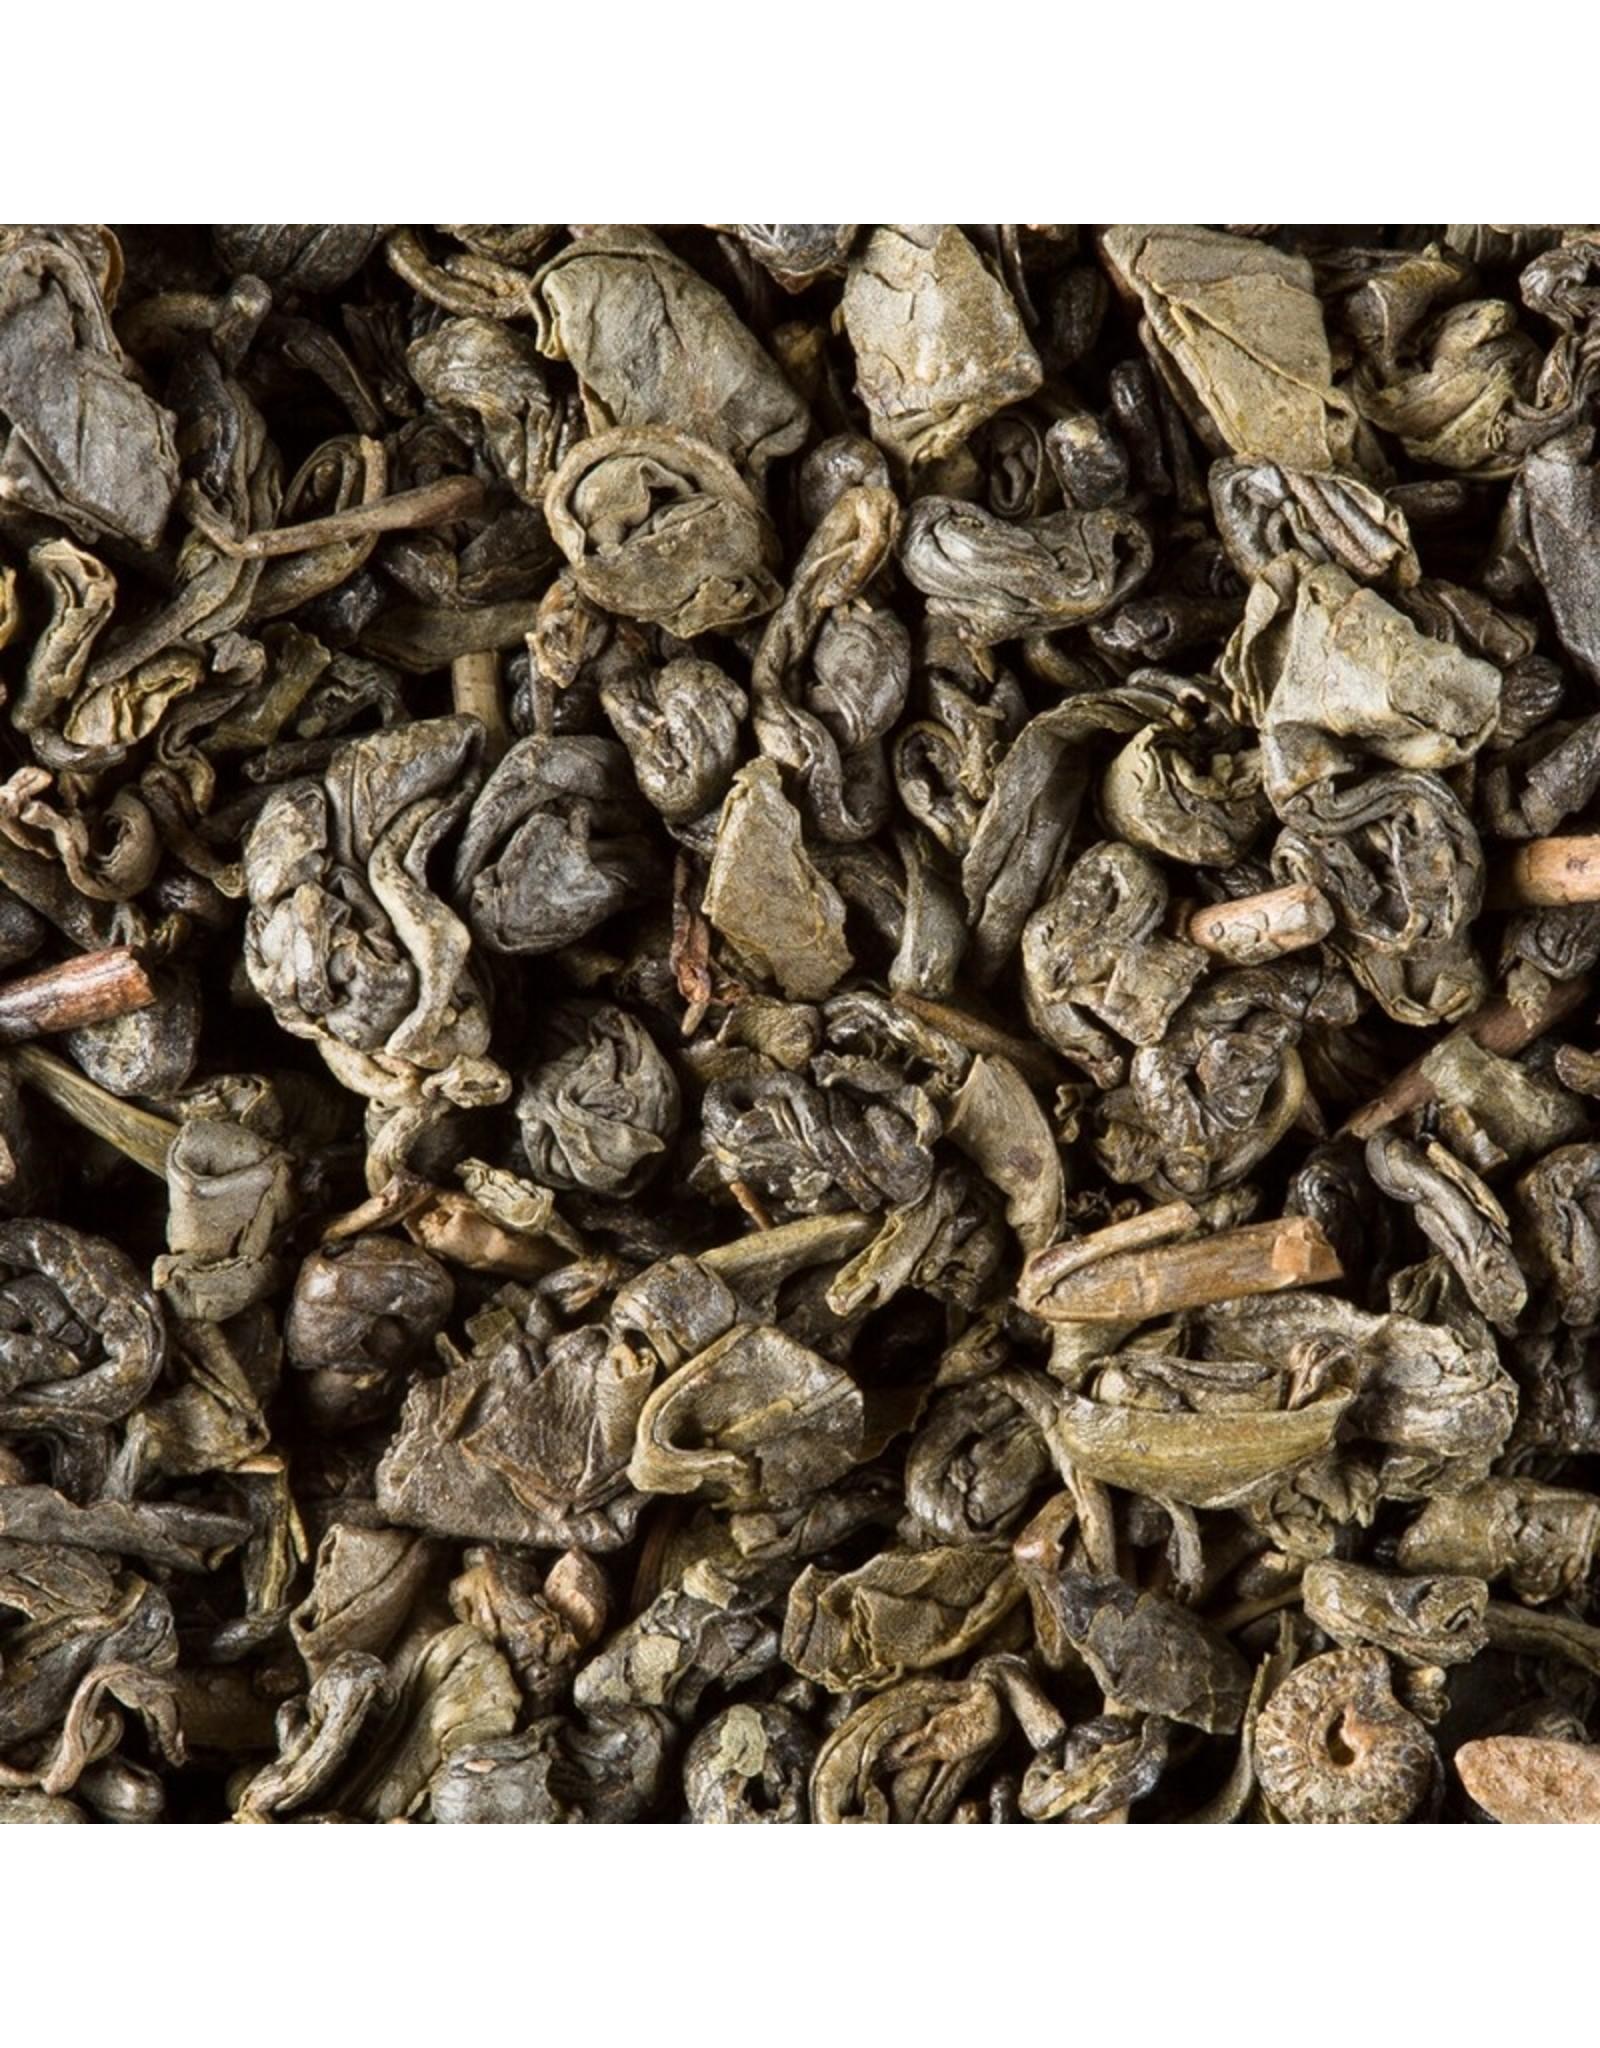 Dammann 'Gunpowder' Green tea